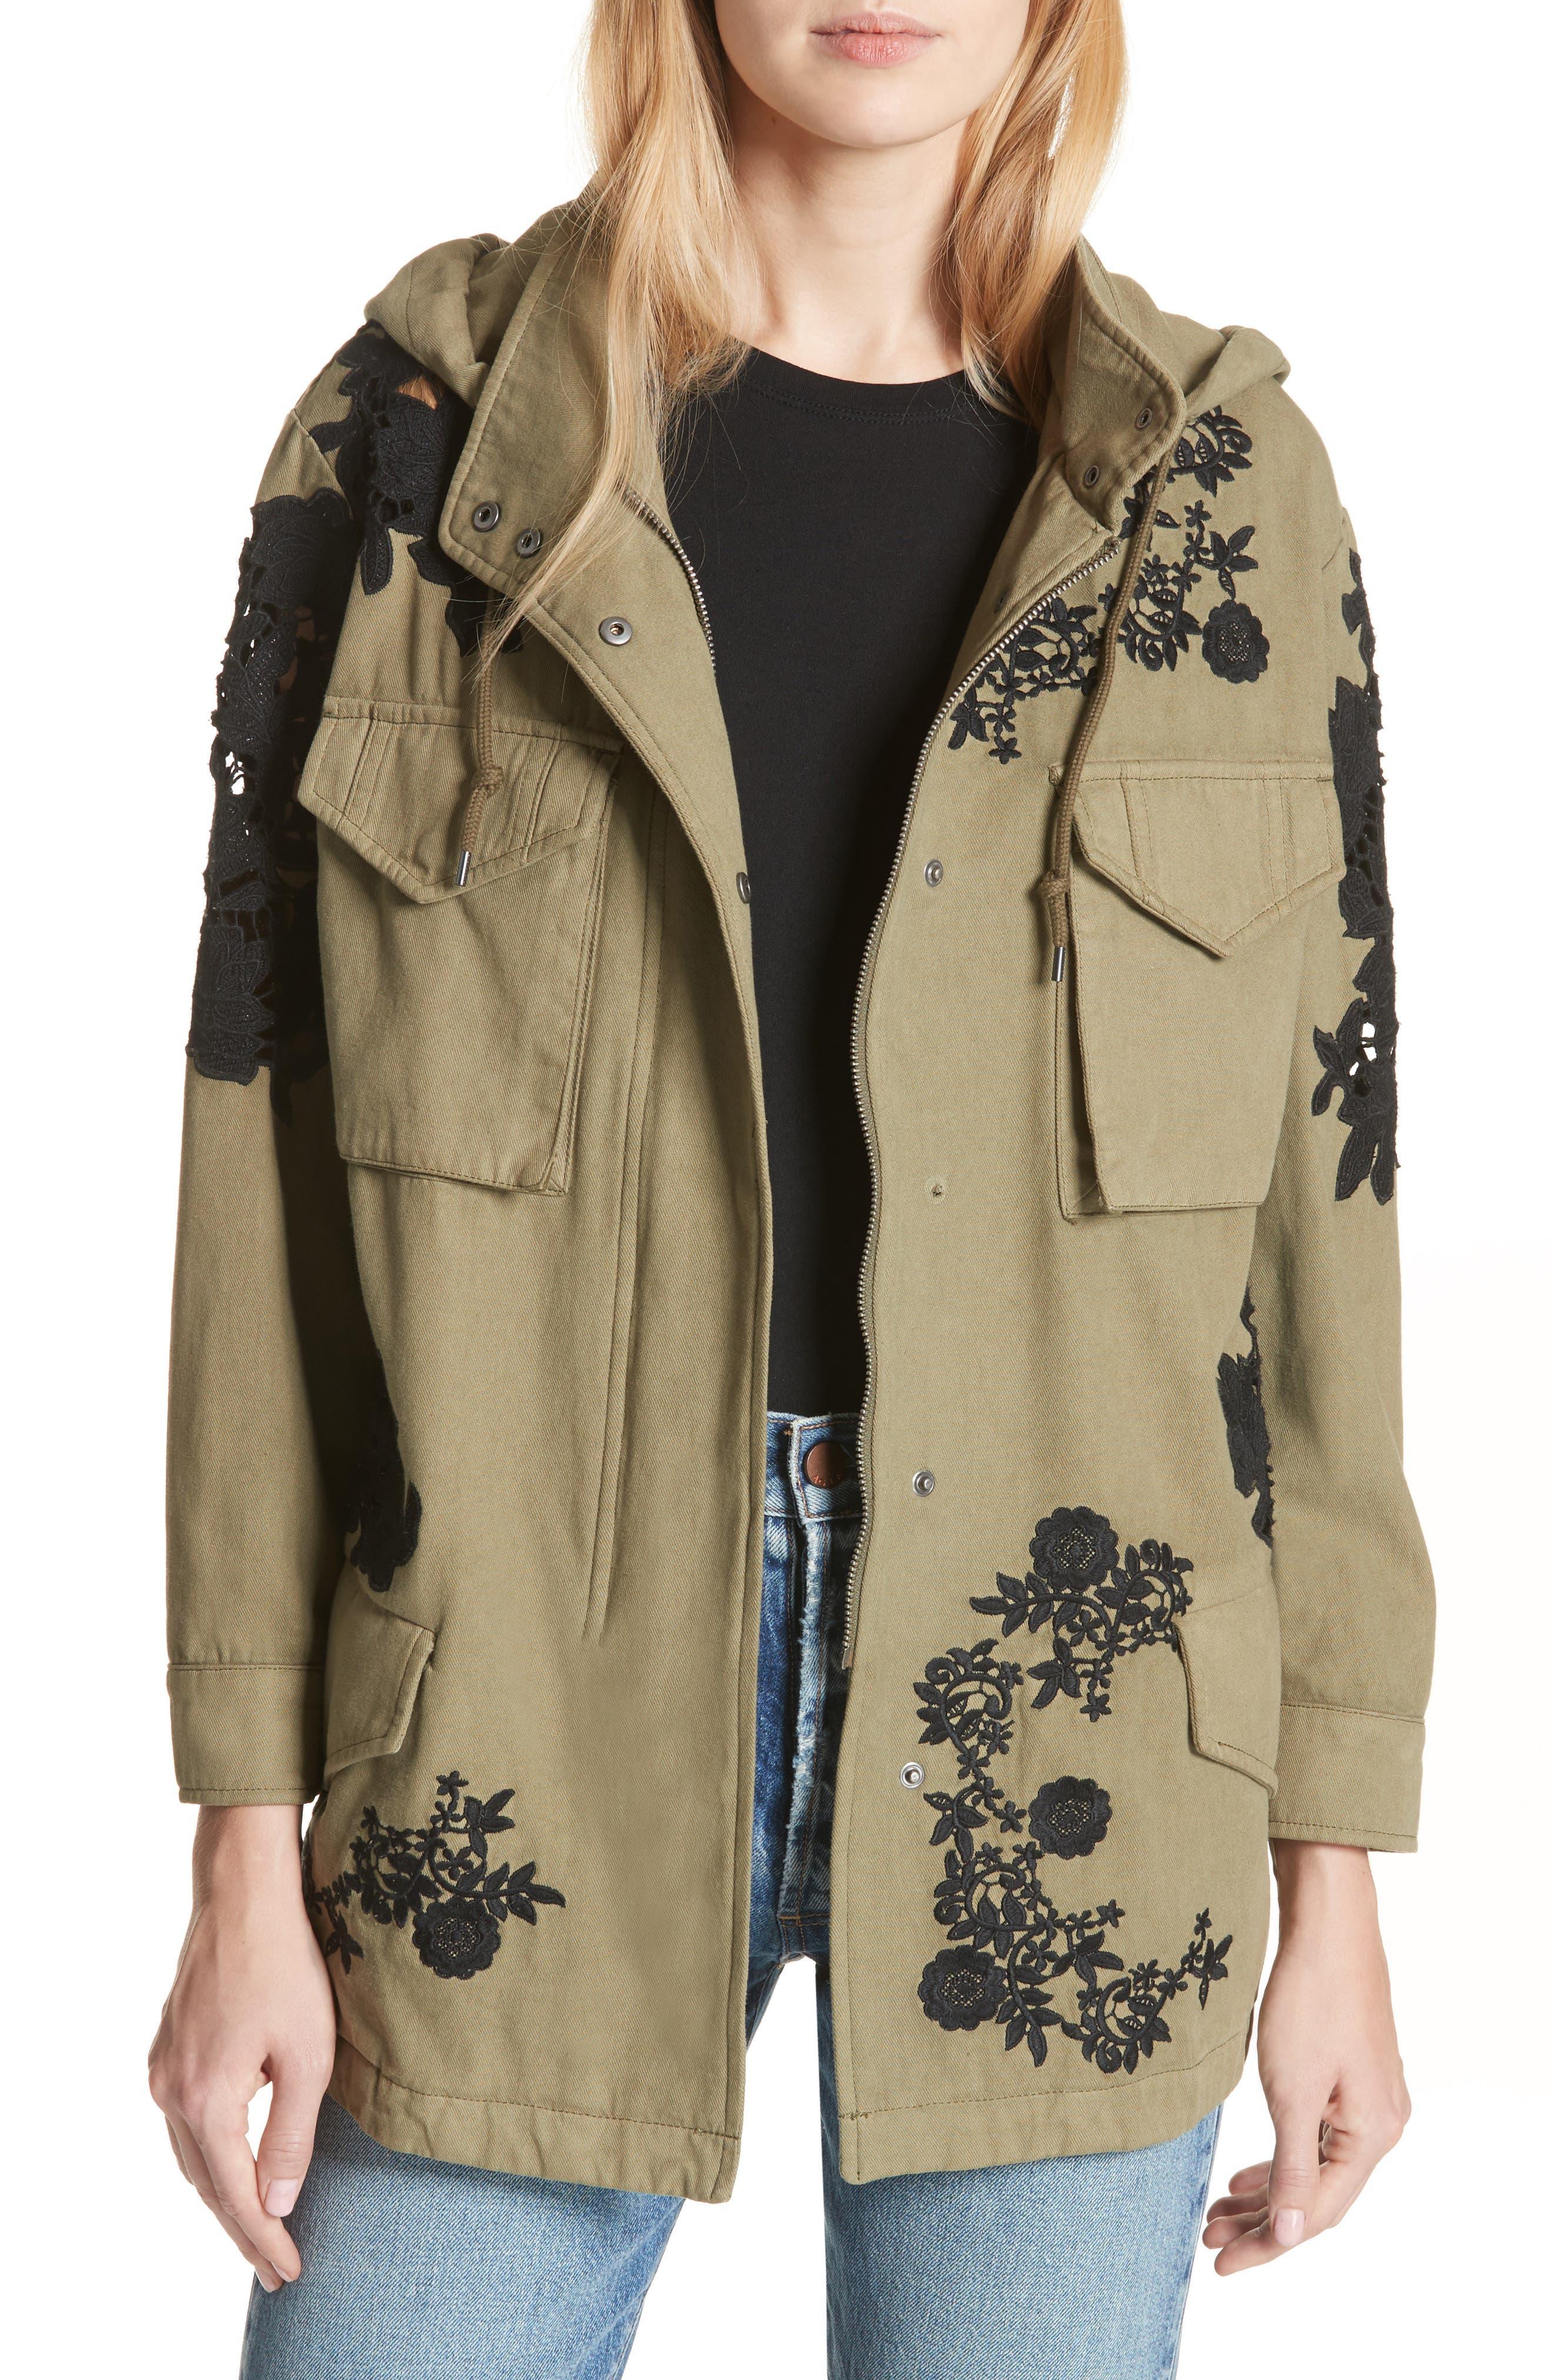 Meta Embroidered Utility Jacket,                         Main,                         color, Olive/ Black